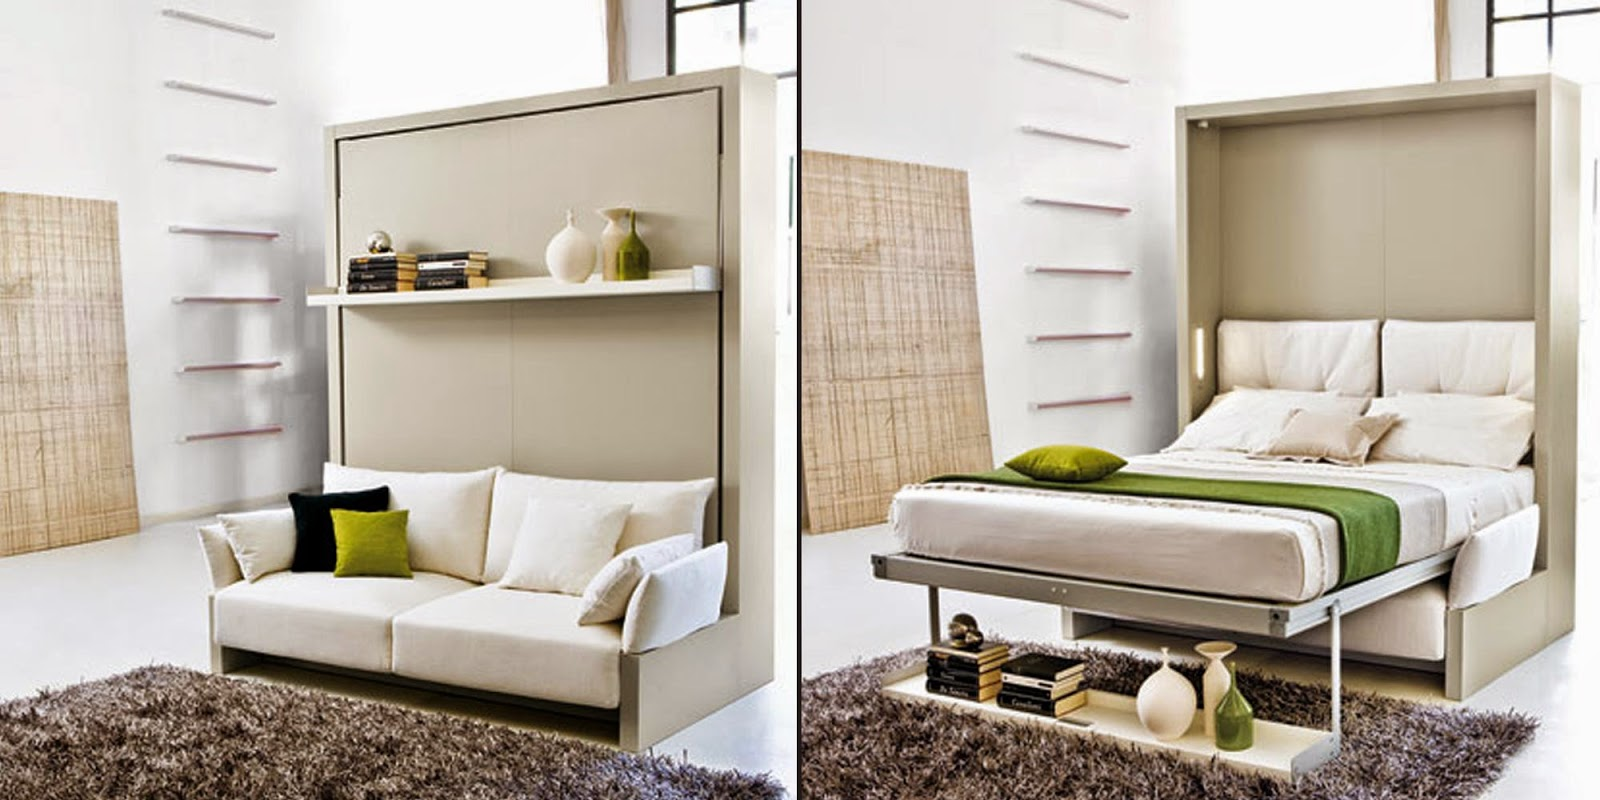 smart furniture design. smart furniture griya inspiratif design